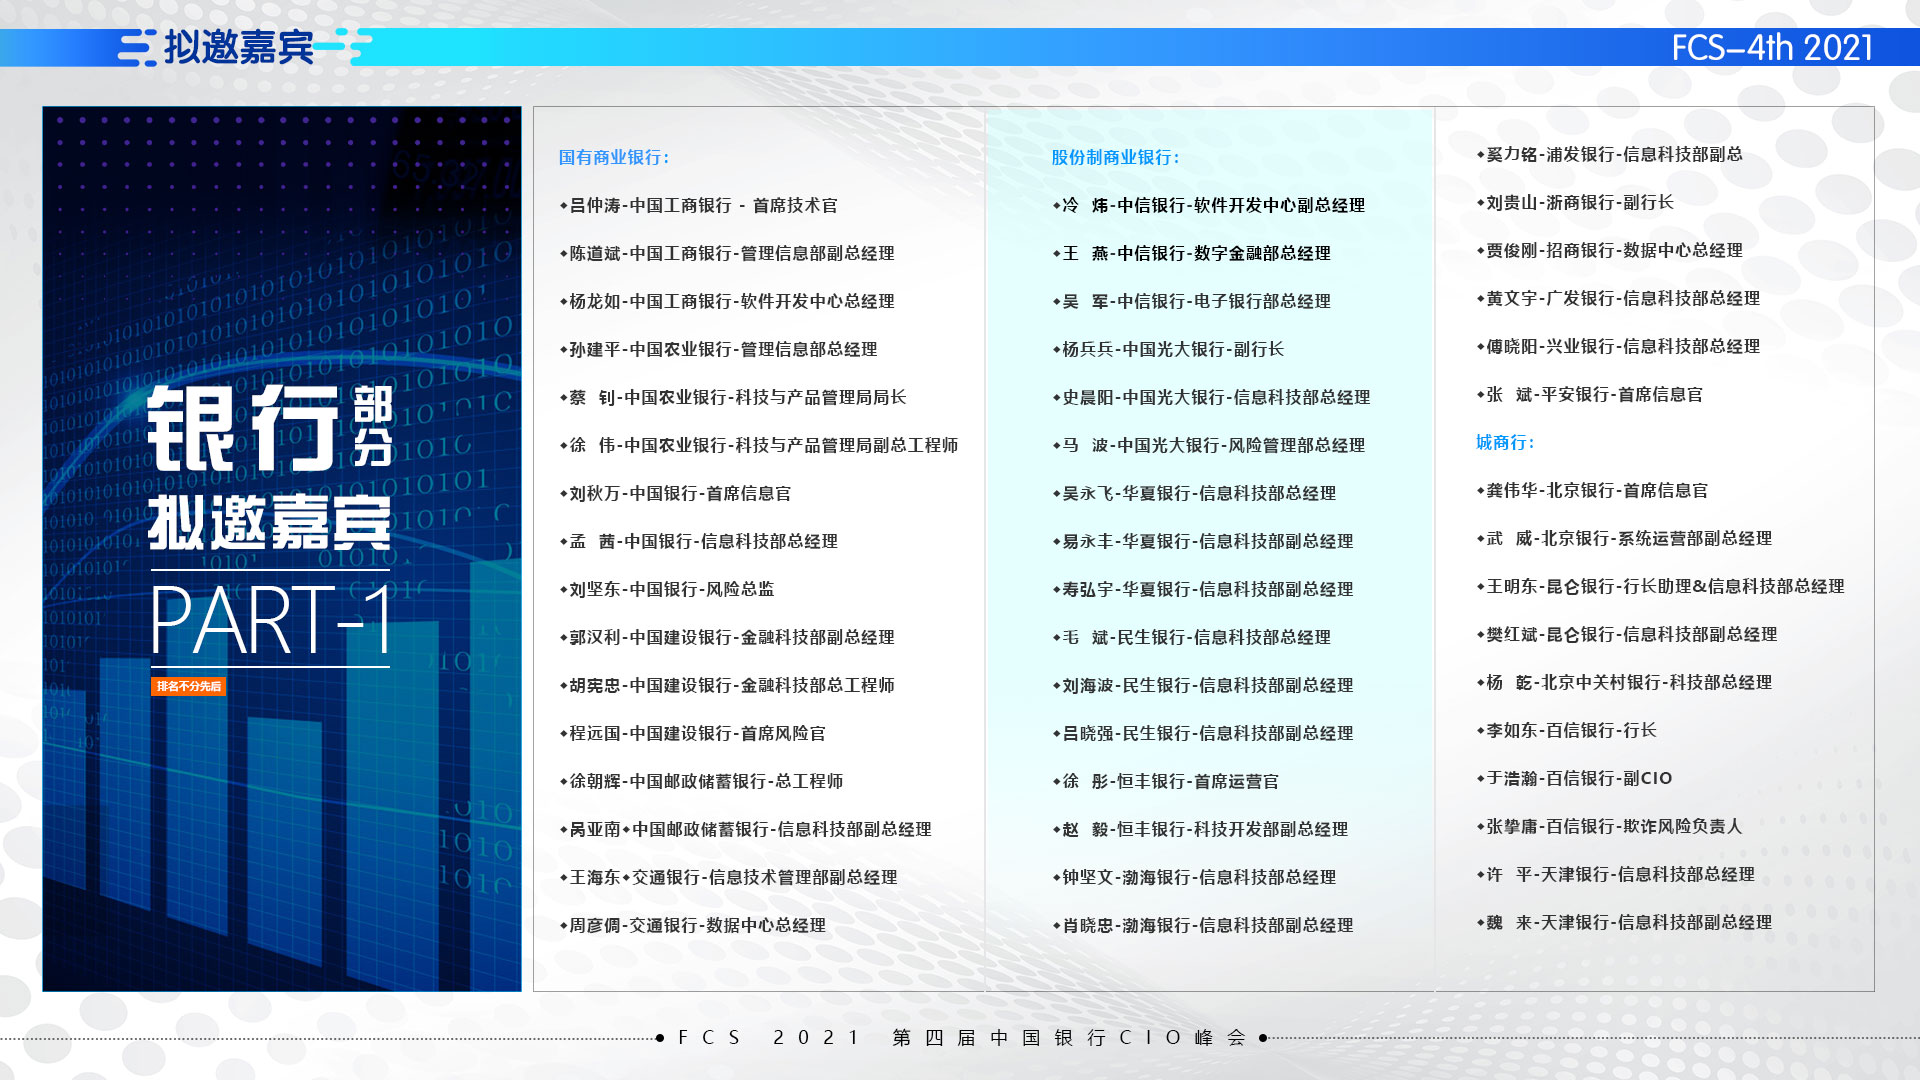 FCS 2021第四届中国银行CIO峰会(华北)